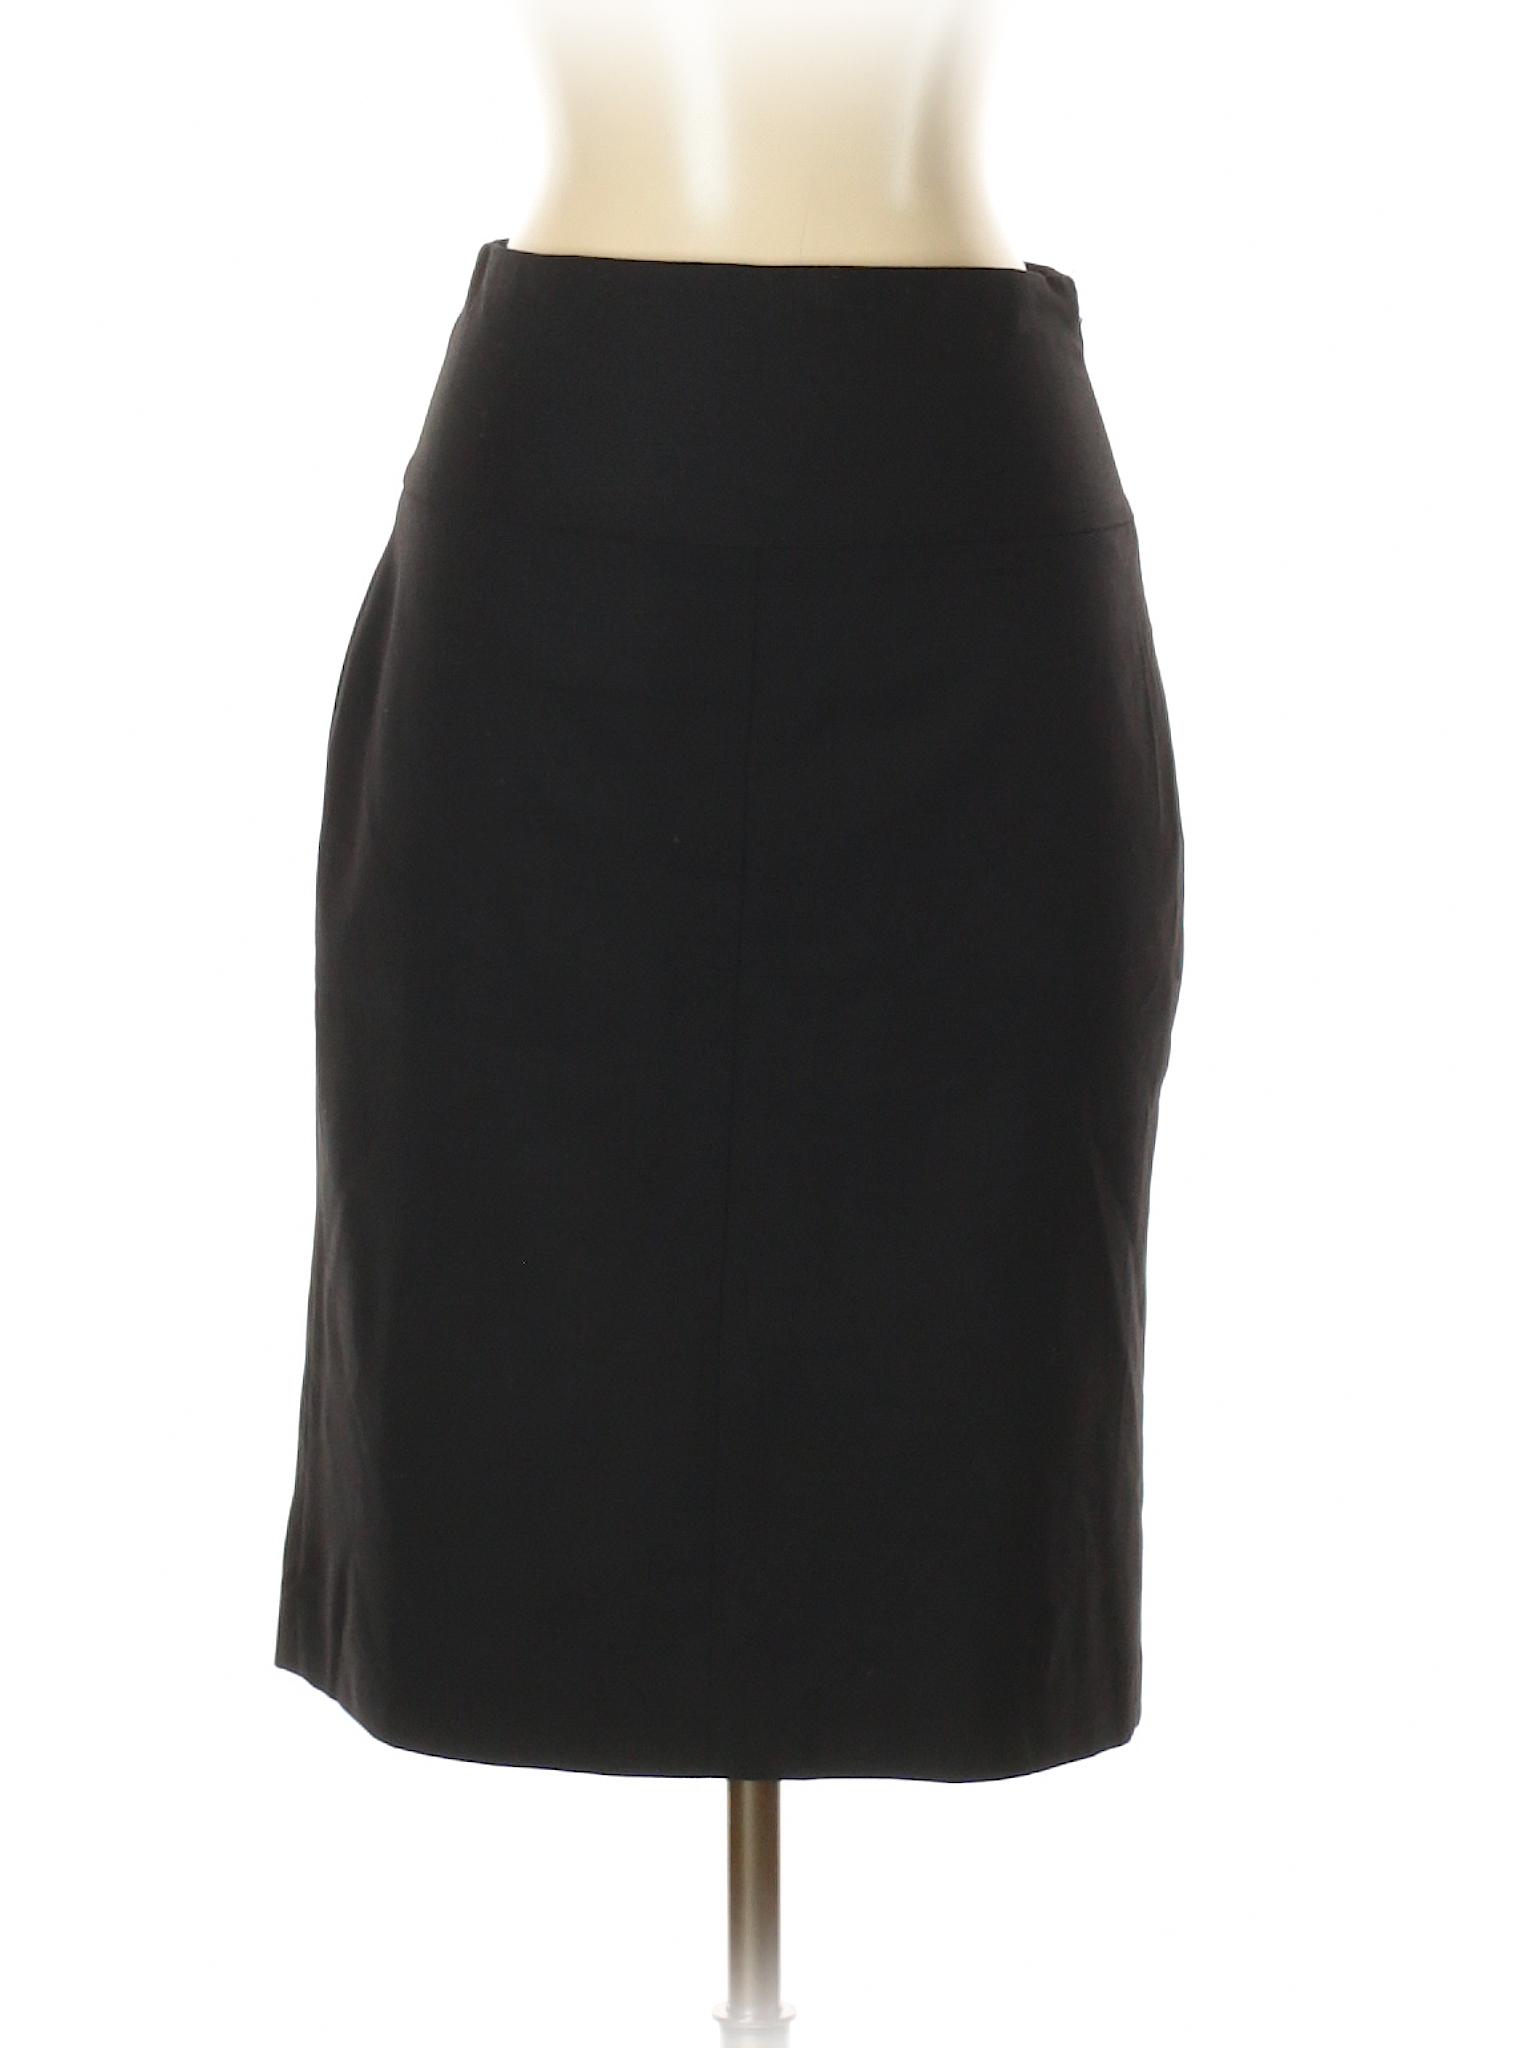 Boutique Boutique Banana Republic Banana Republic Wool Wool Skirt Skirt SxIrSq